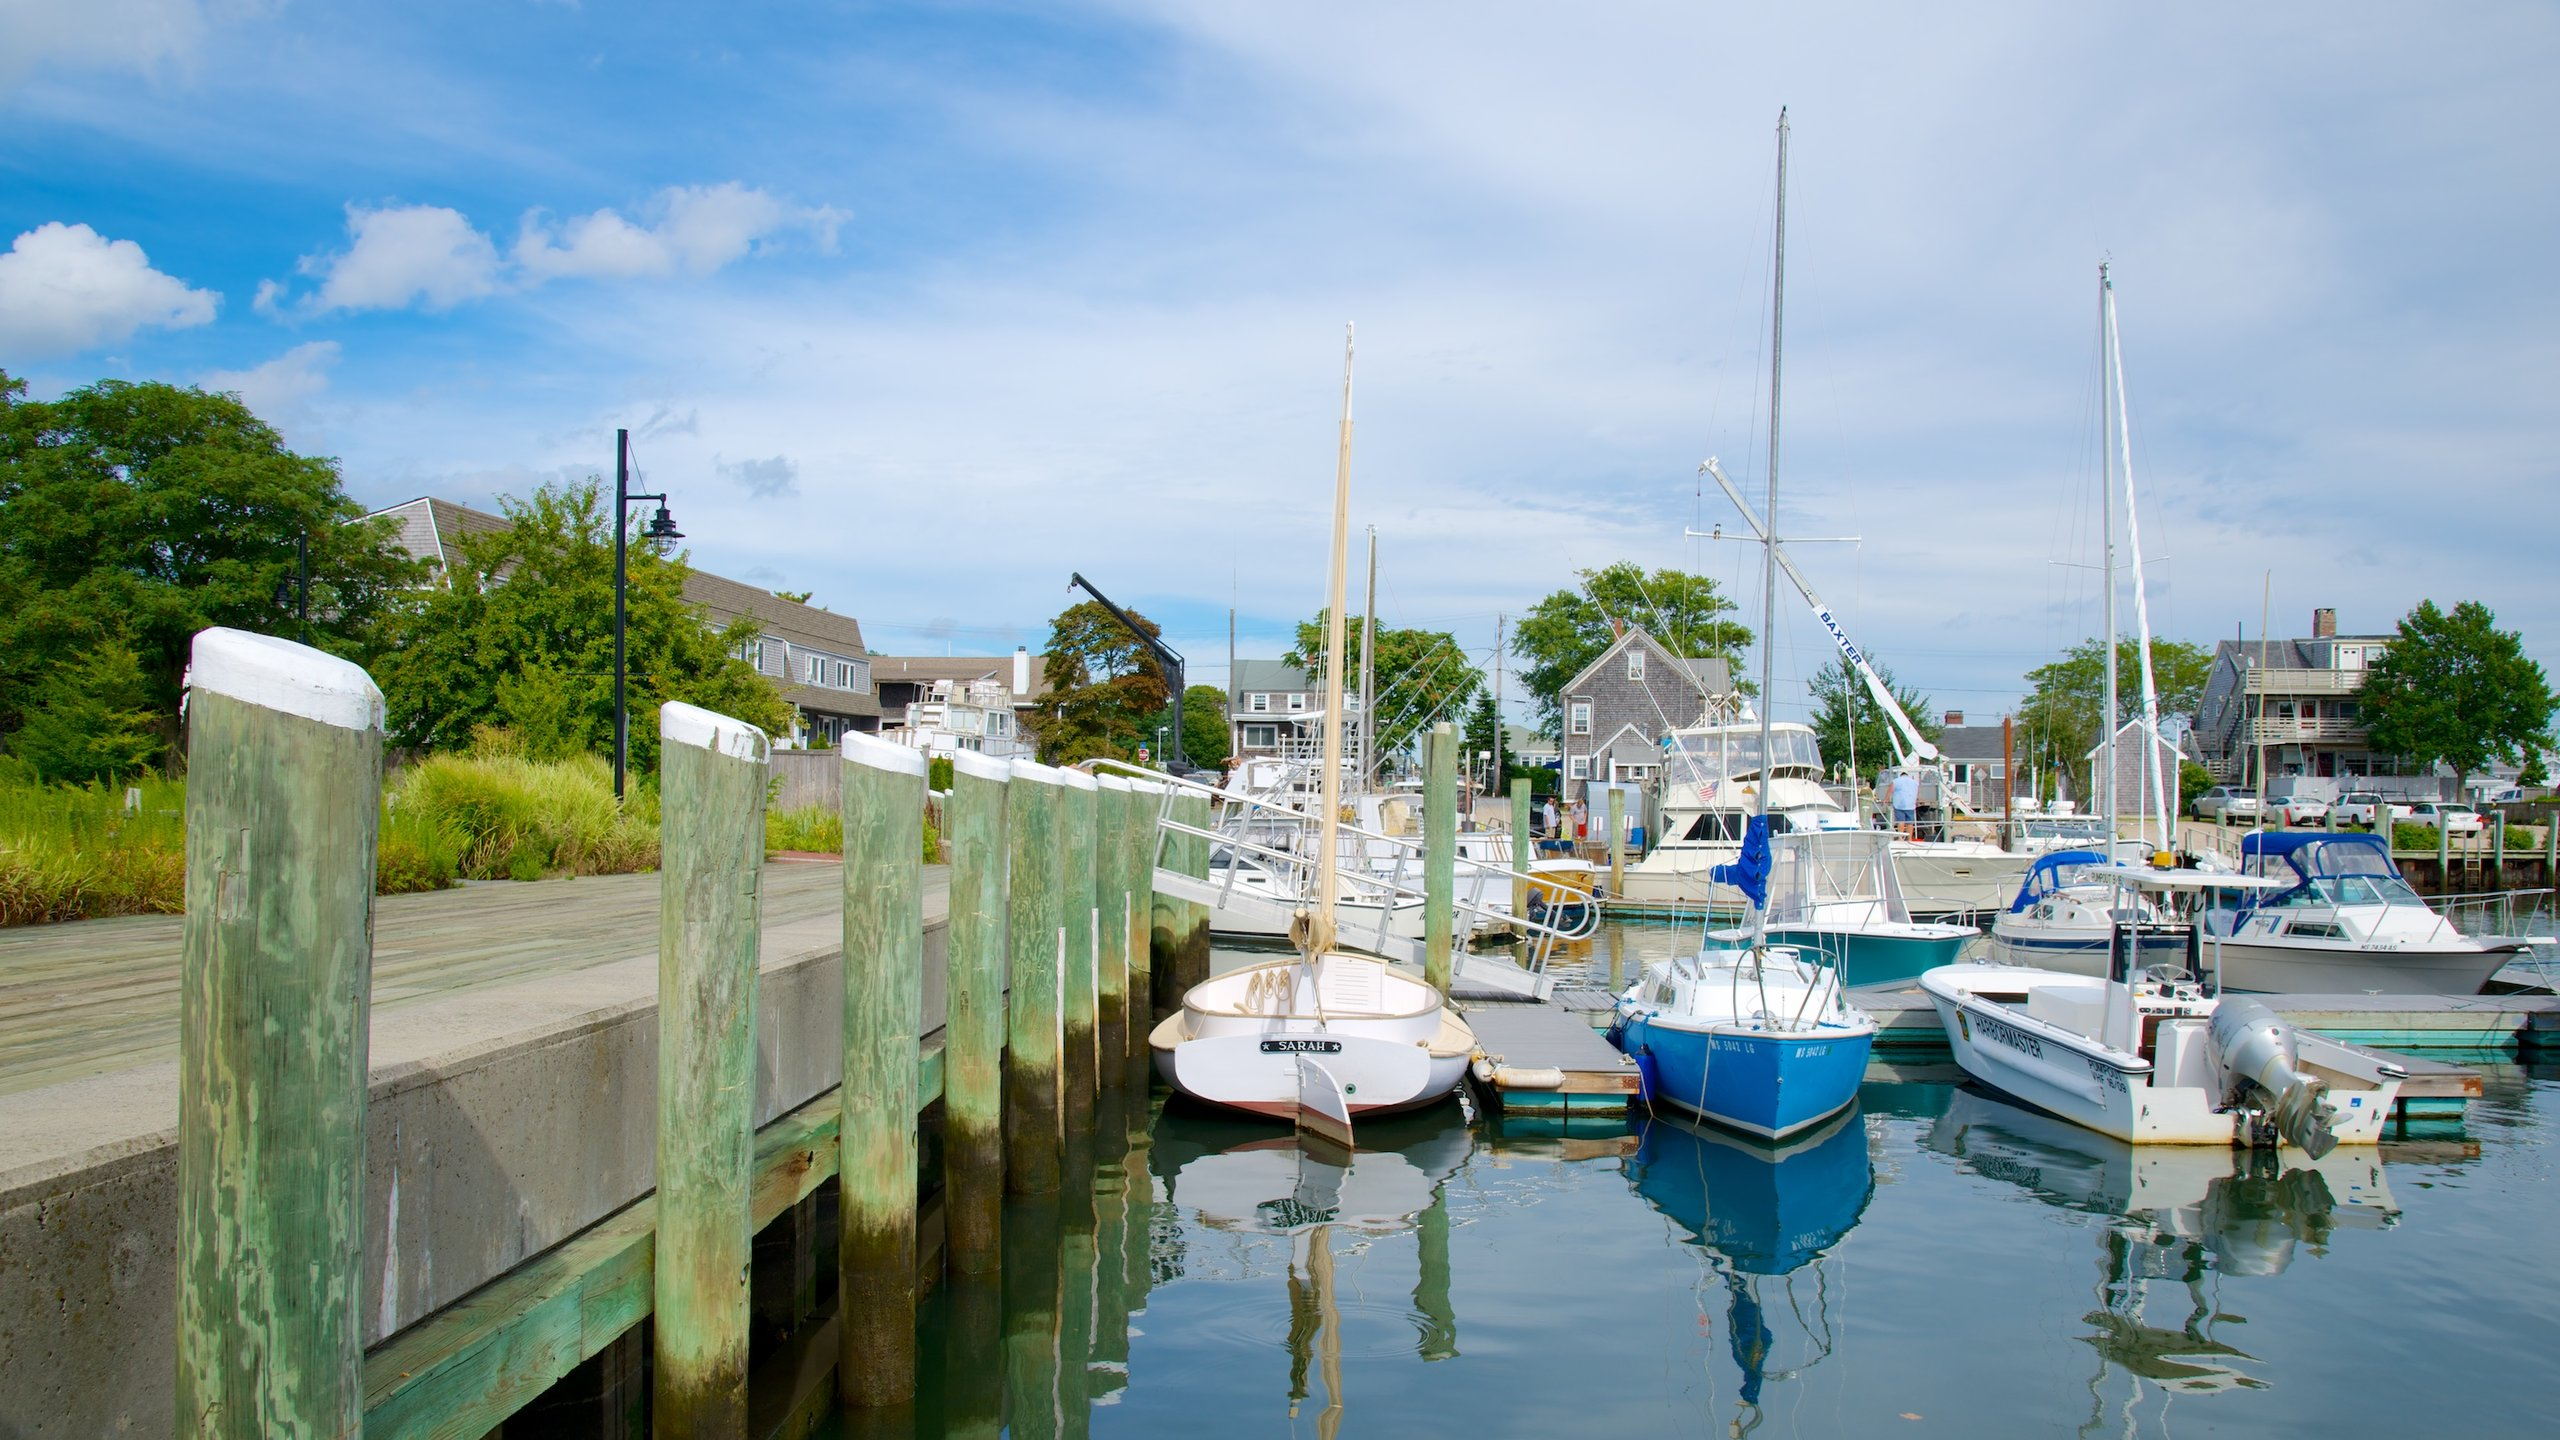 Hyannis, Massachusetts, United States of America